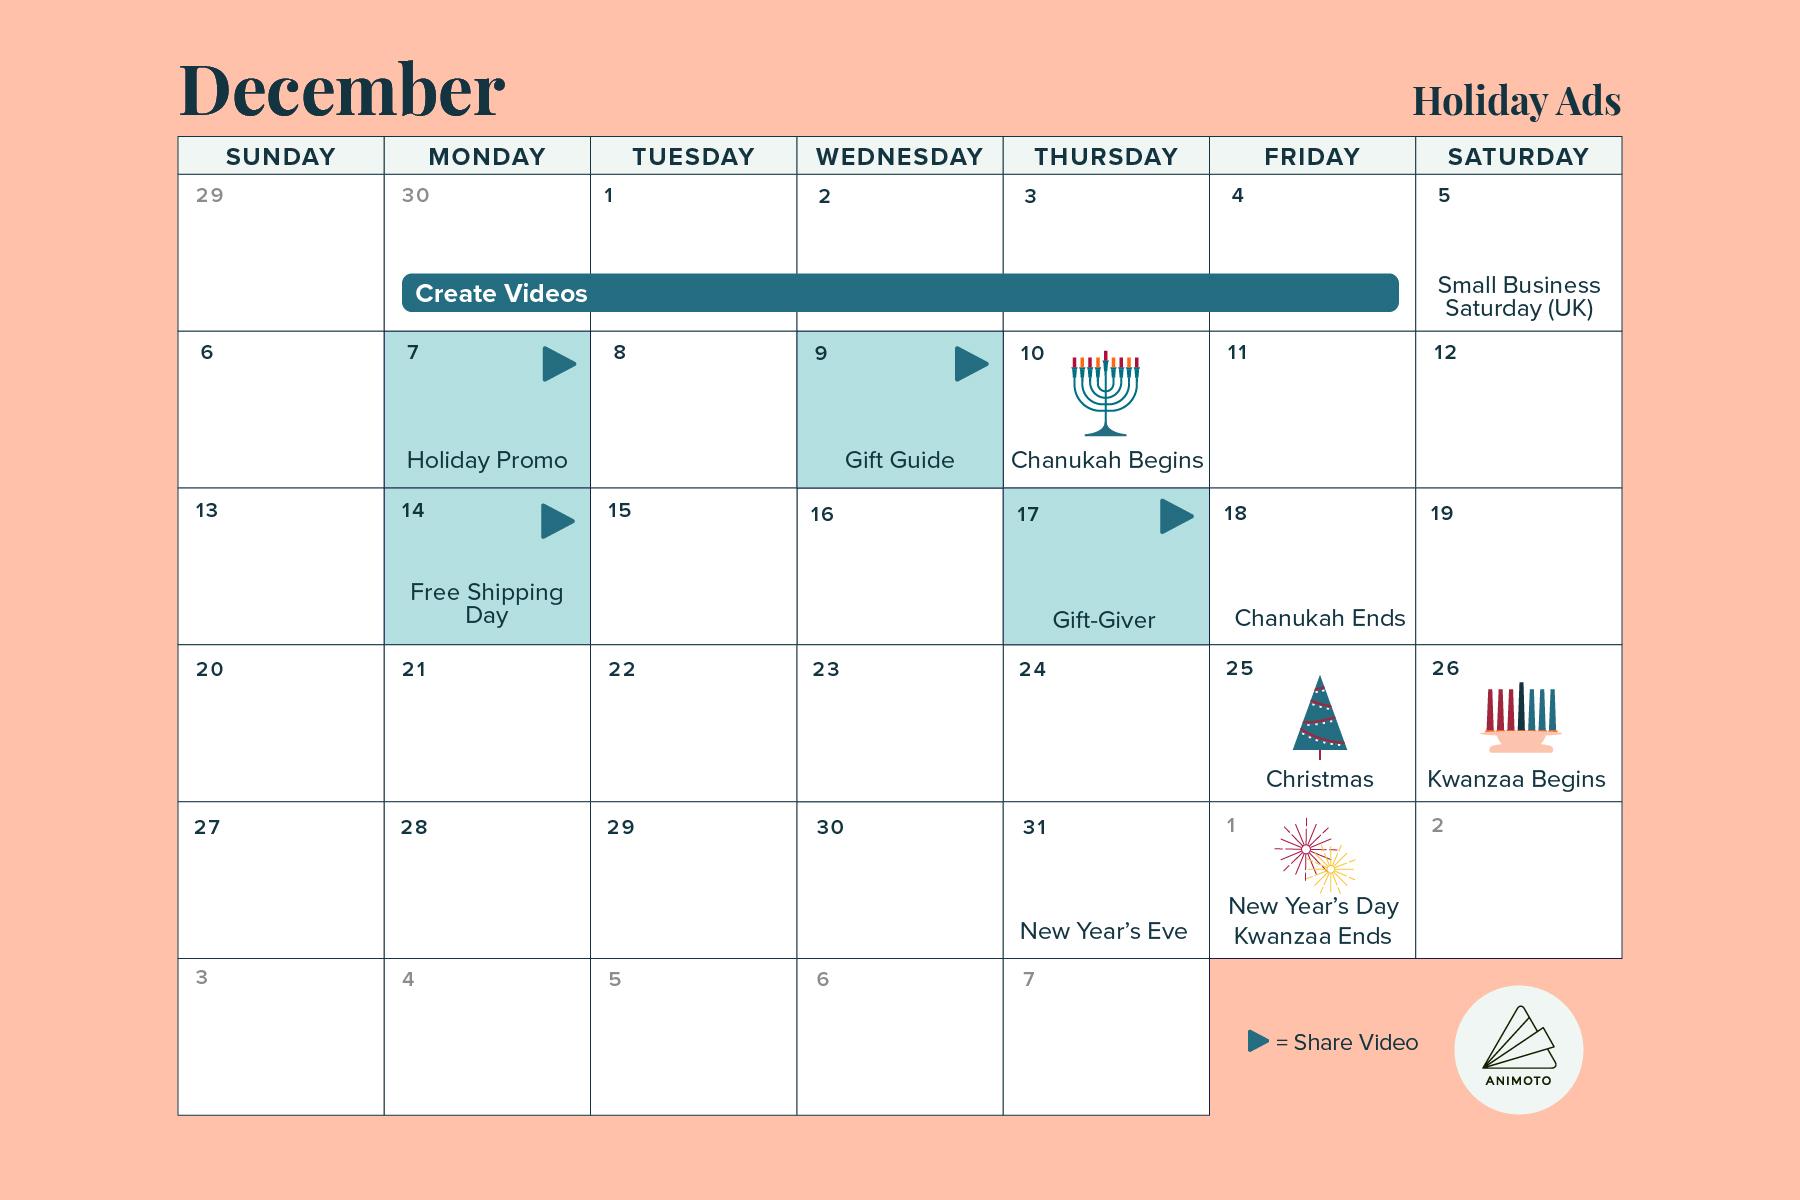 2020-Holiday-Calendar holiday-ads